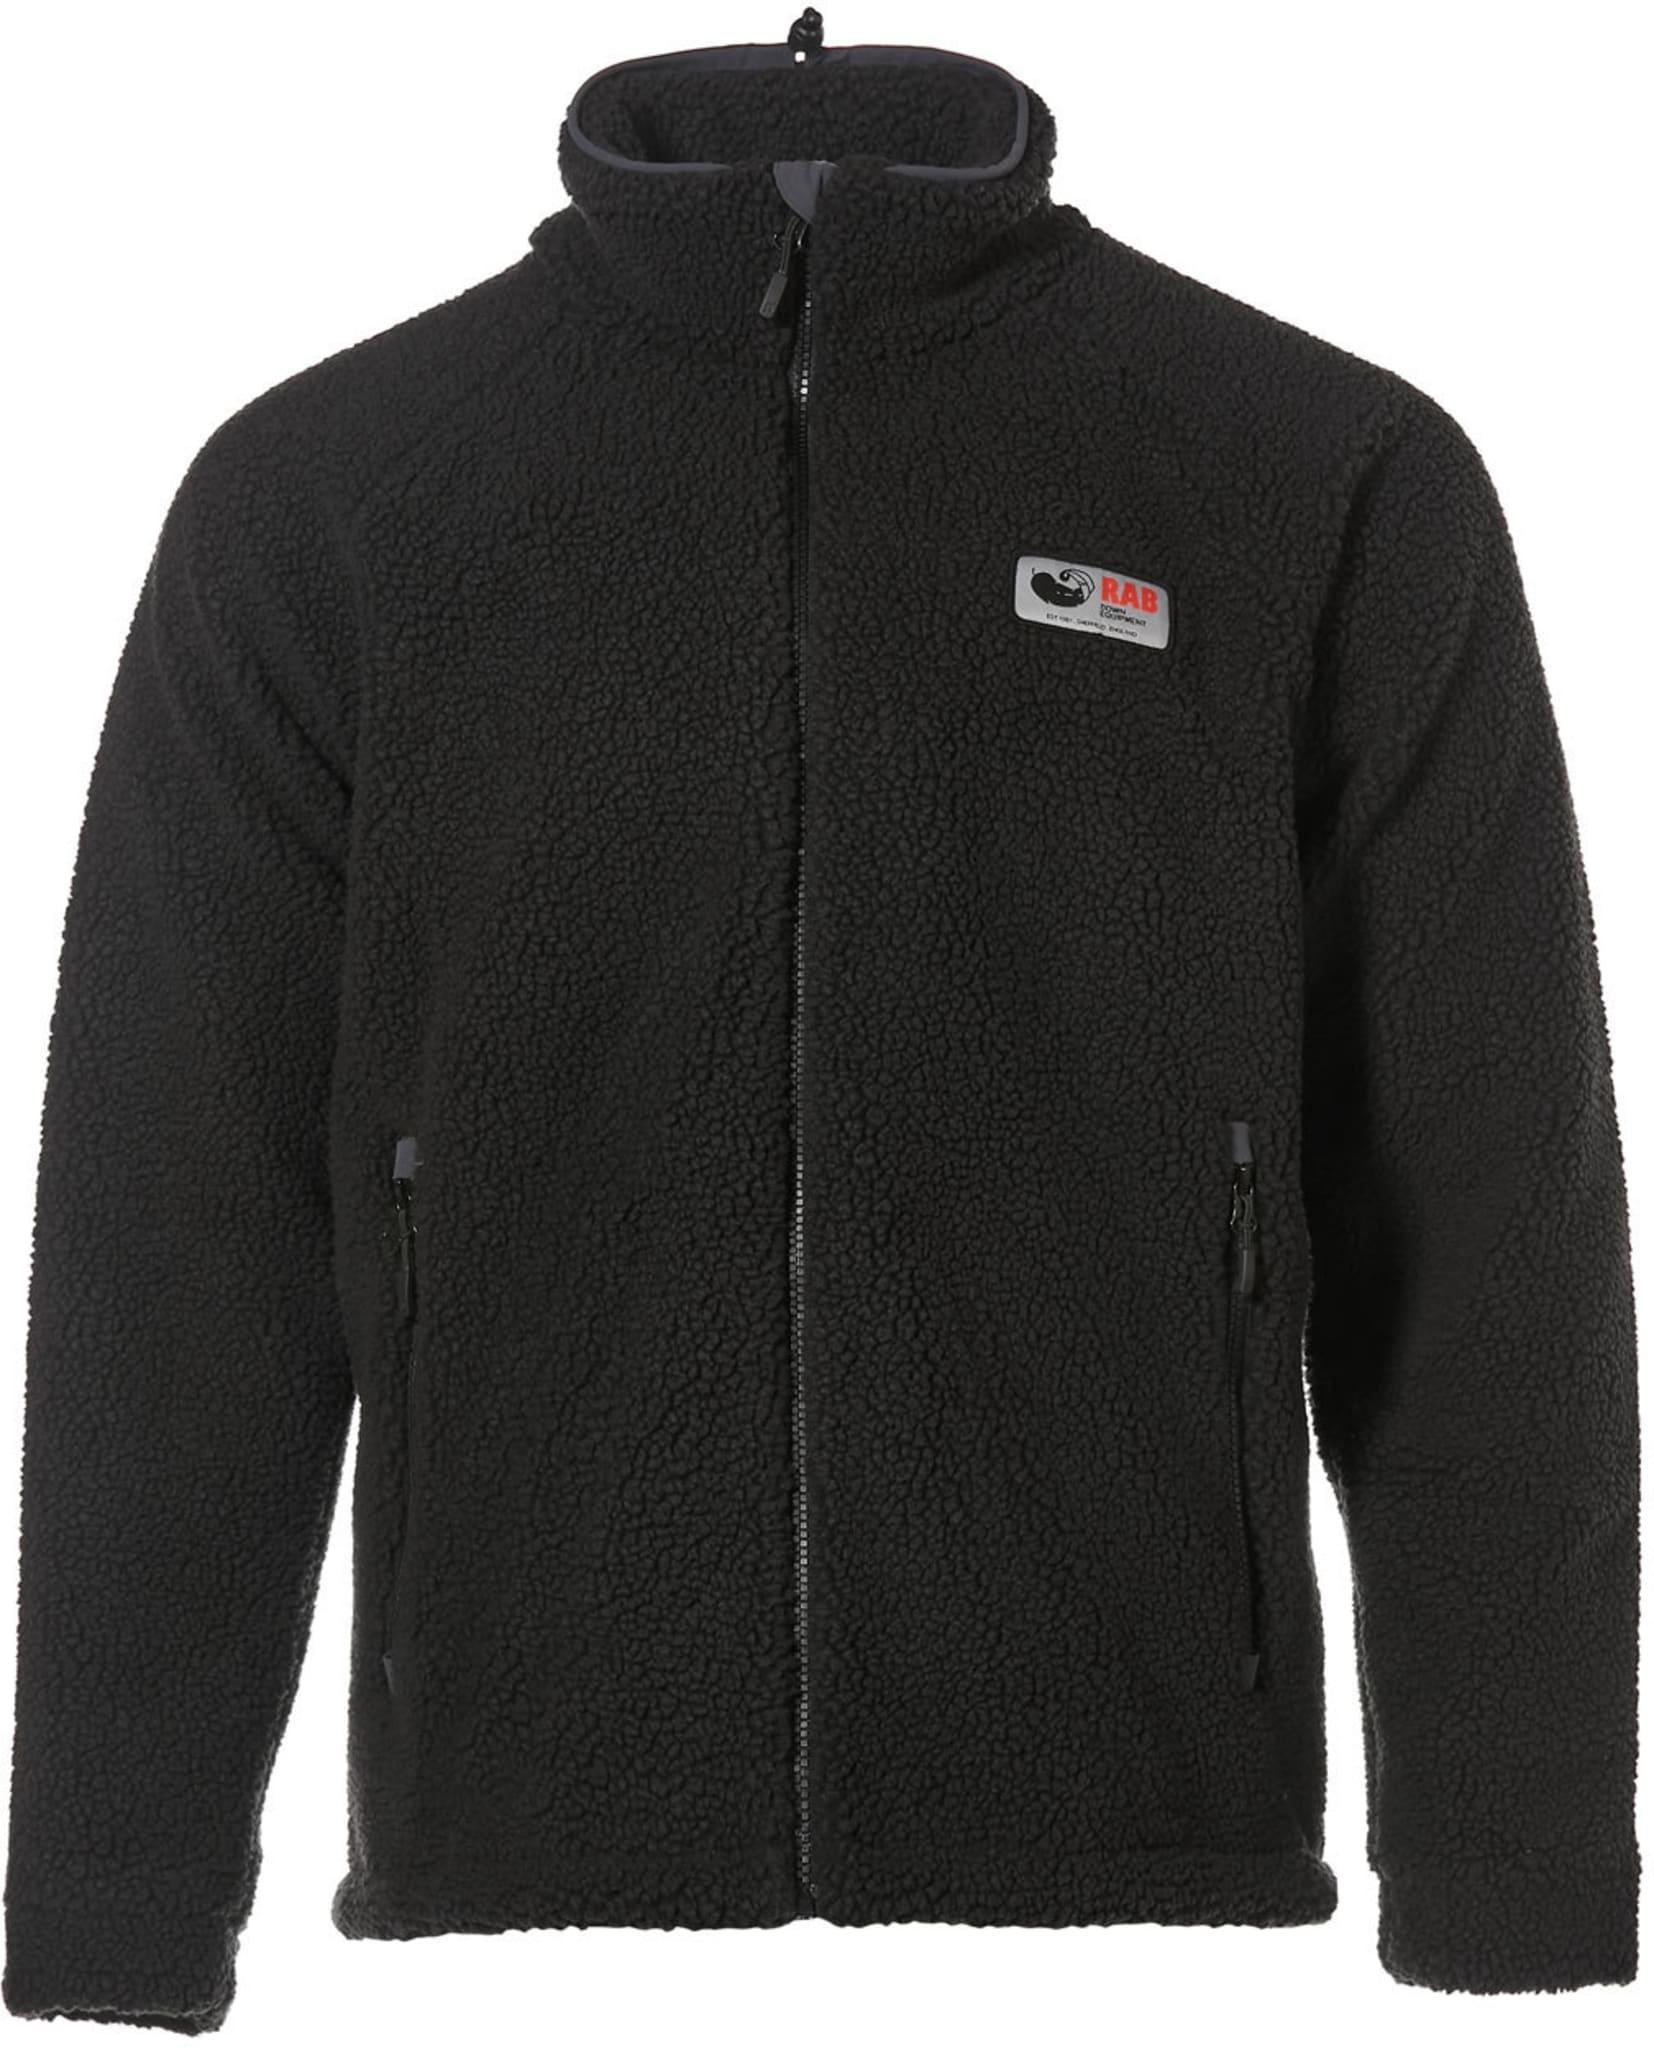 Retro-fleece med behagelig passform